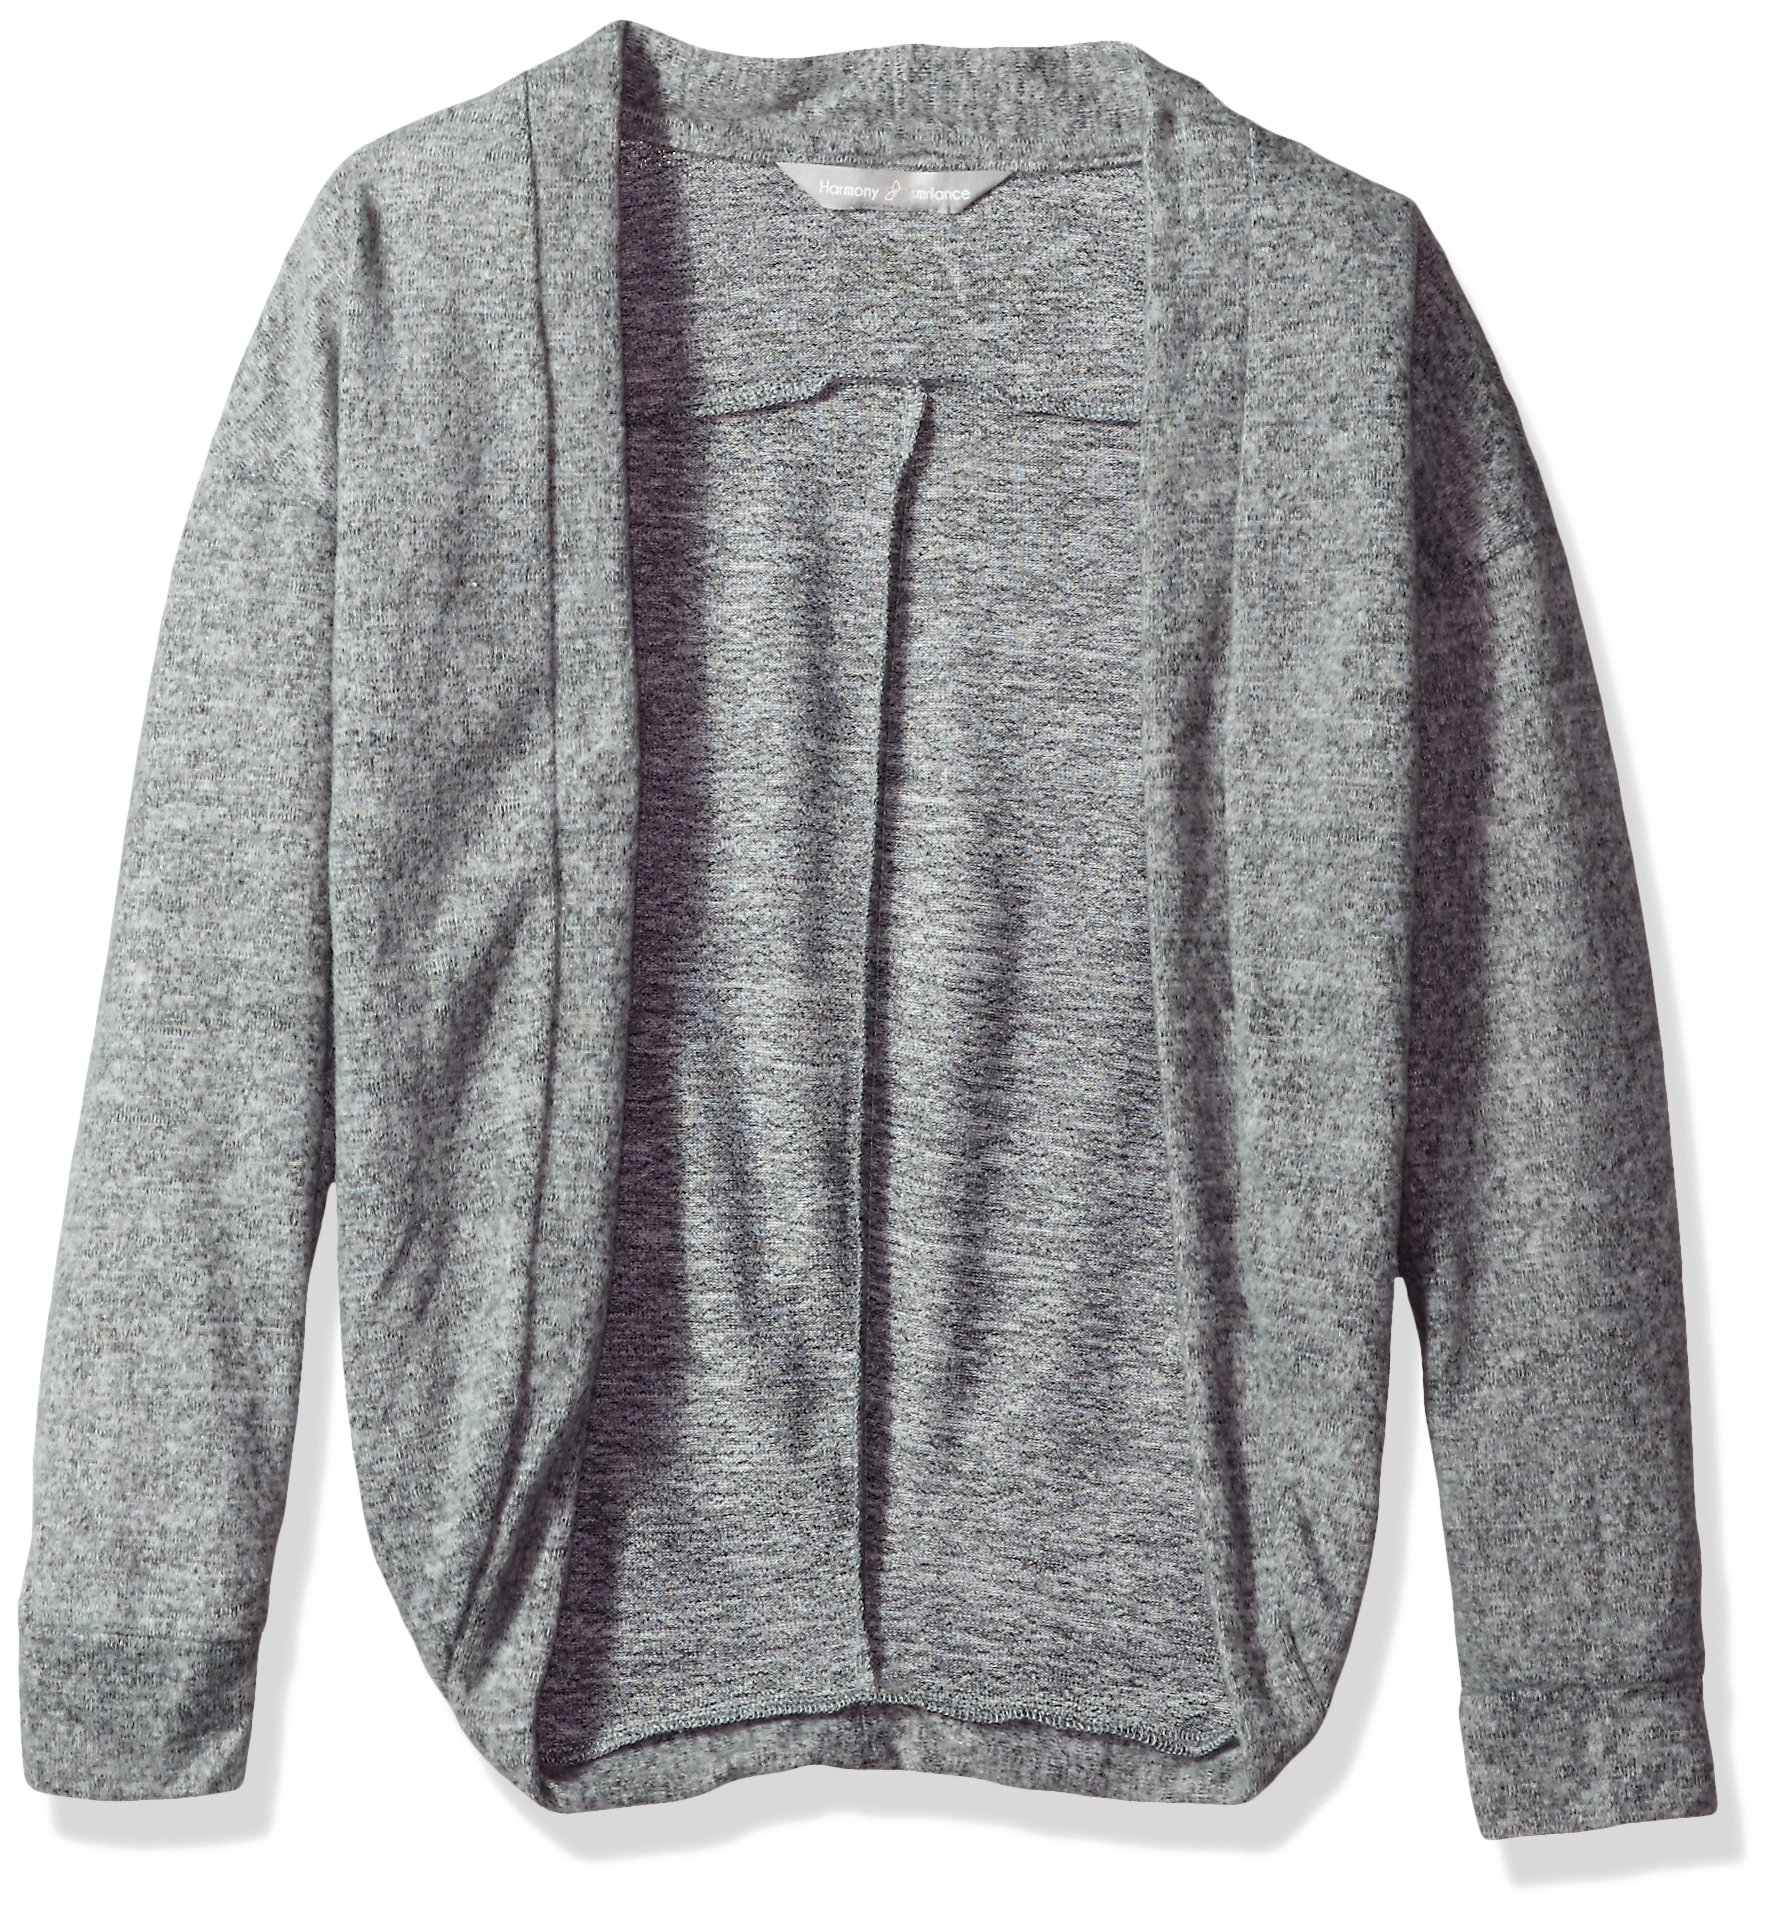 Harmony and Balance Big Girls' Long Sleeve Sweater Knit Top, Heather Gray, 7/8